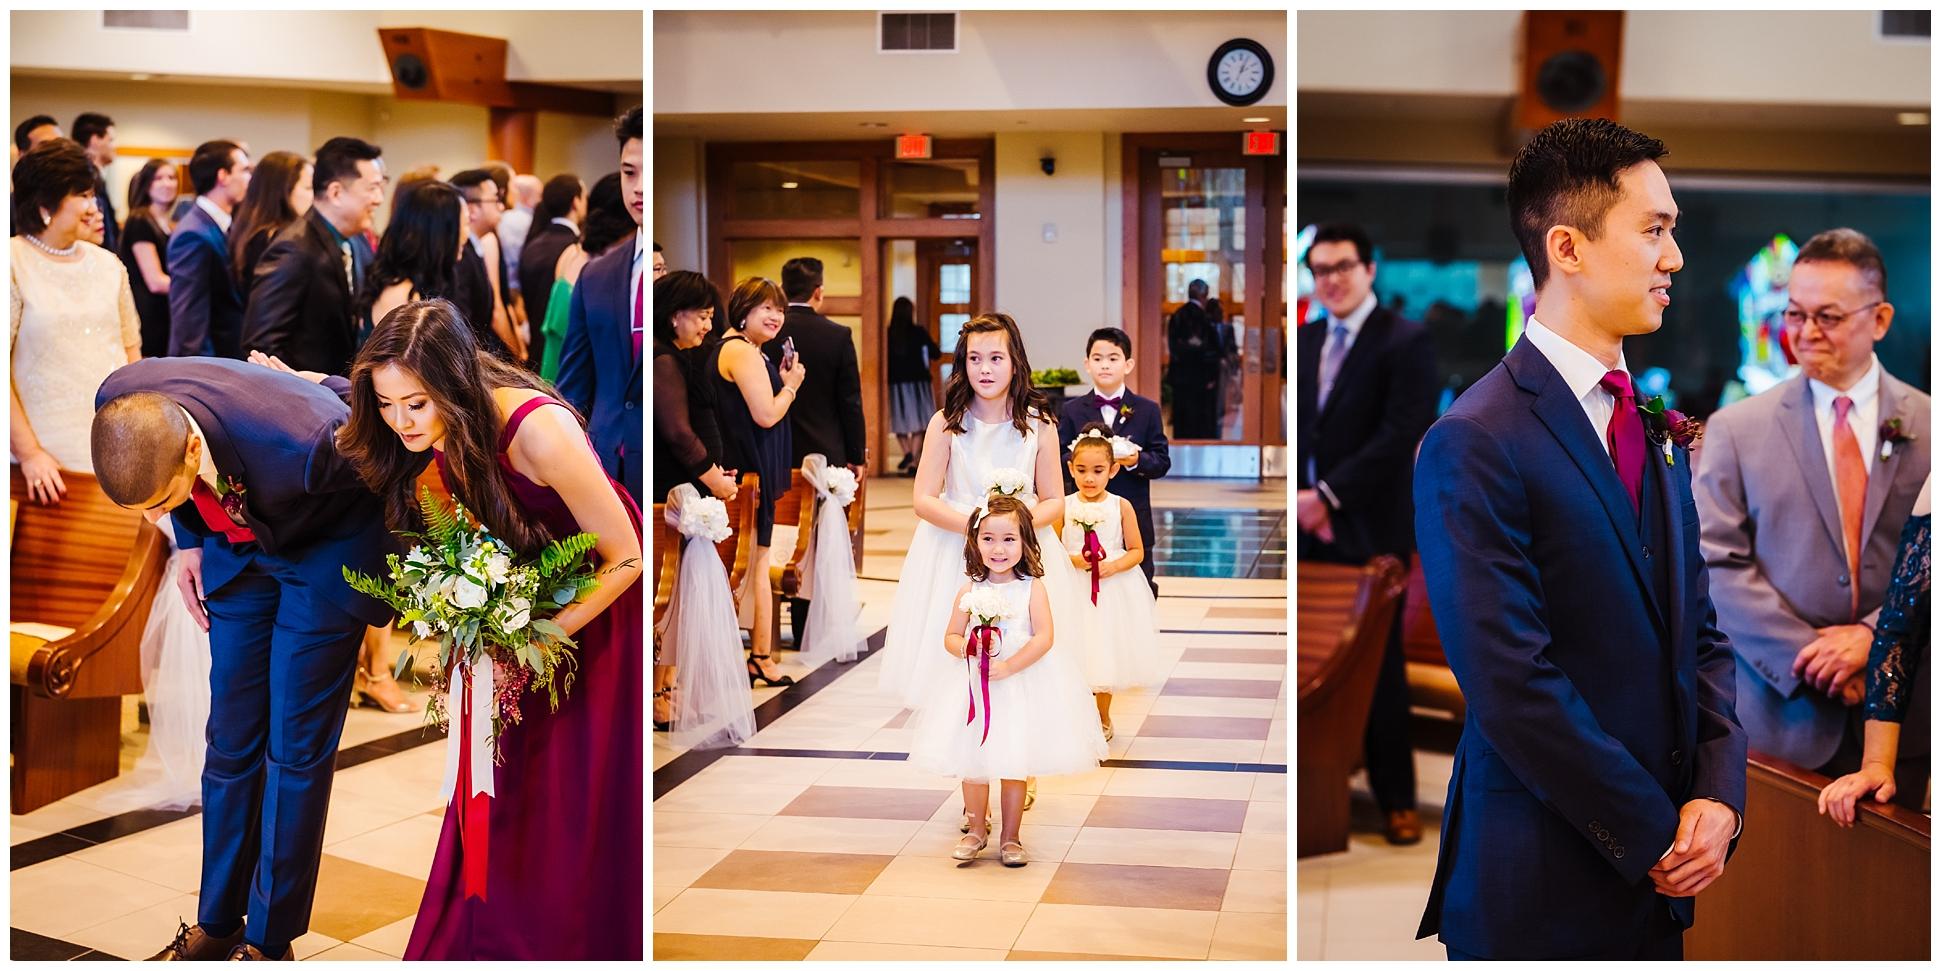 tampa-wedding-photographer-philipino-colorful-woods-ballroom-church-mass-confetti-fuscia_0028.jpg